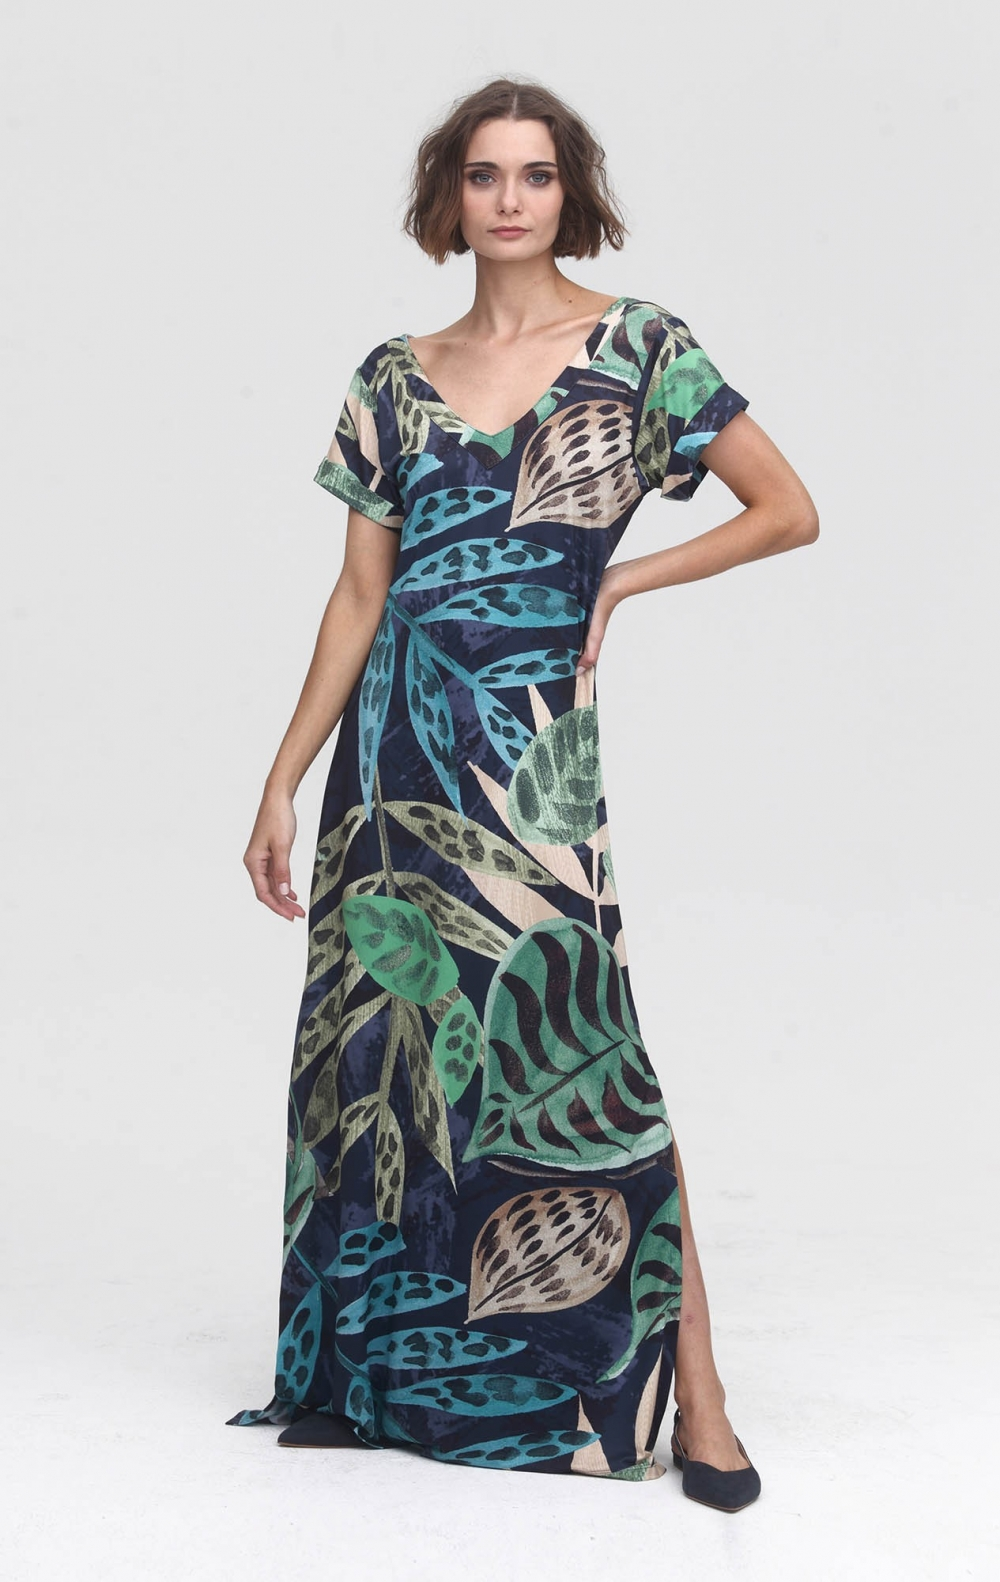 Vestido Malha Carla Estampado  - Foto 1